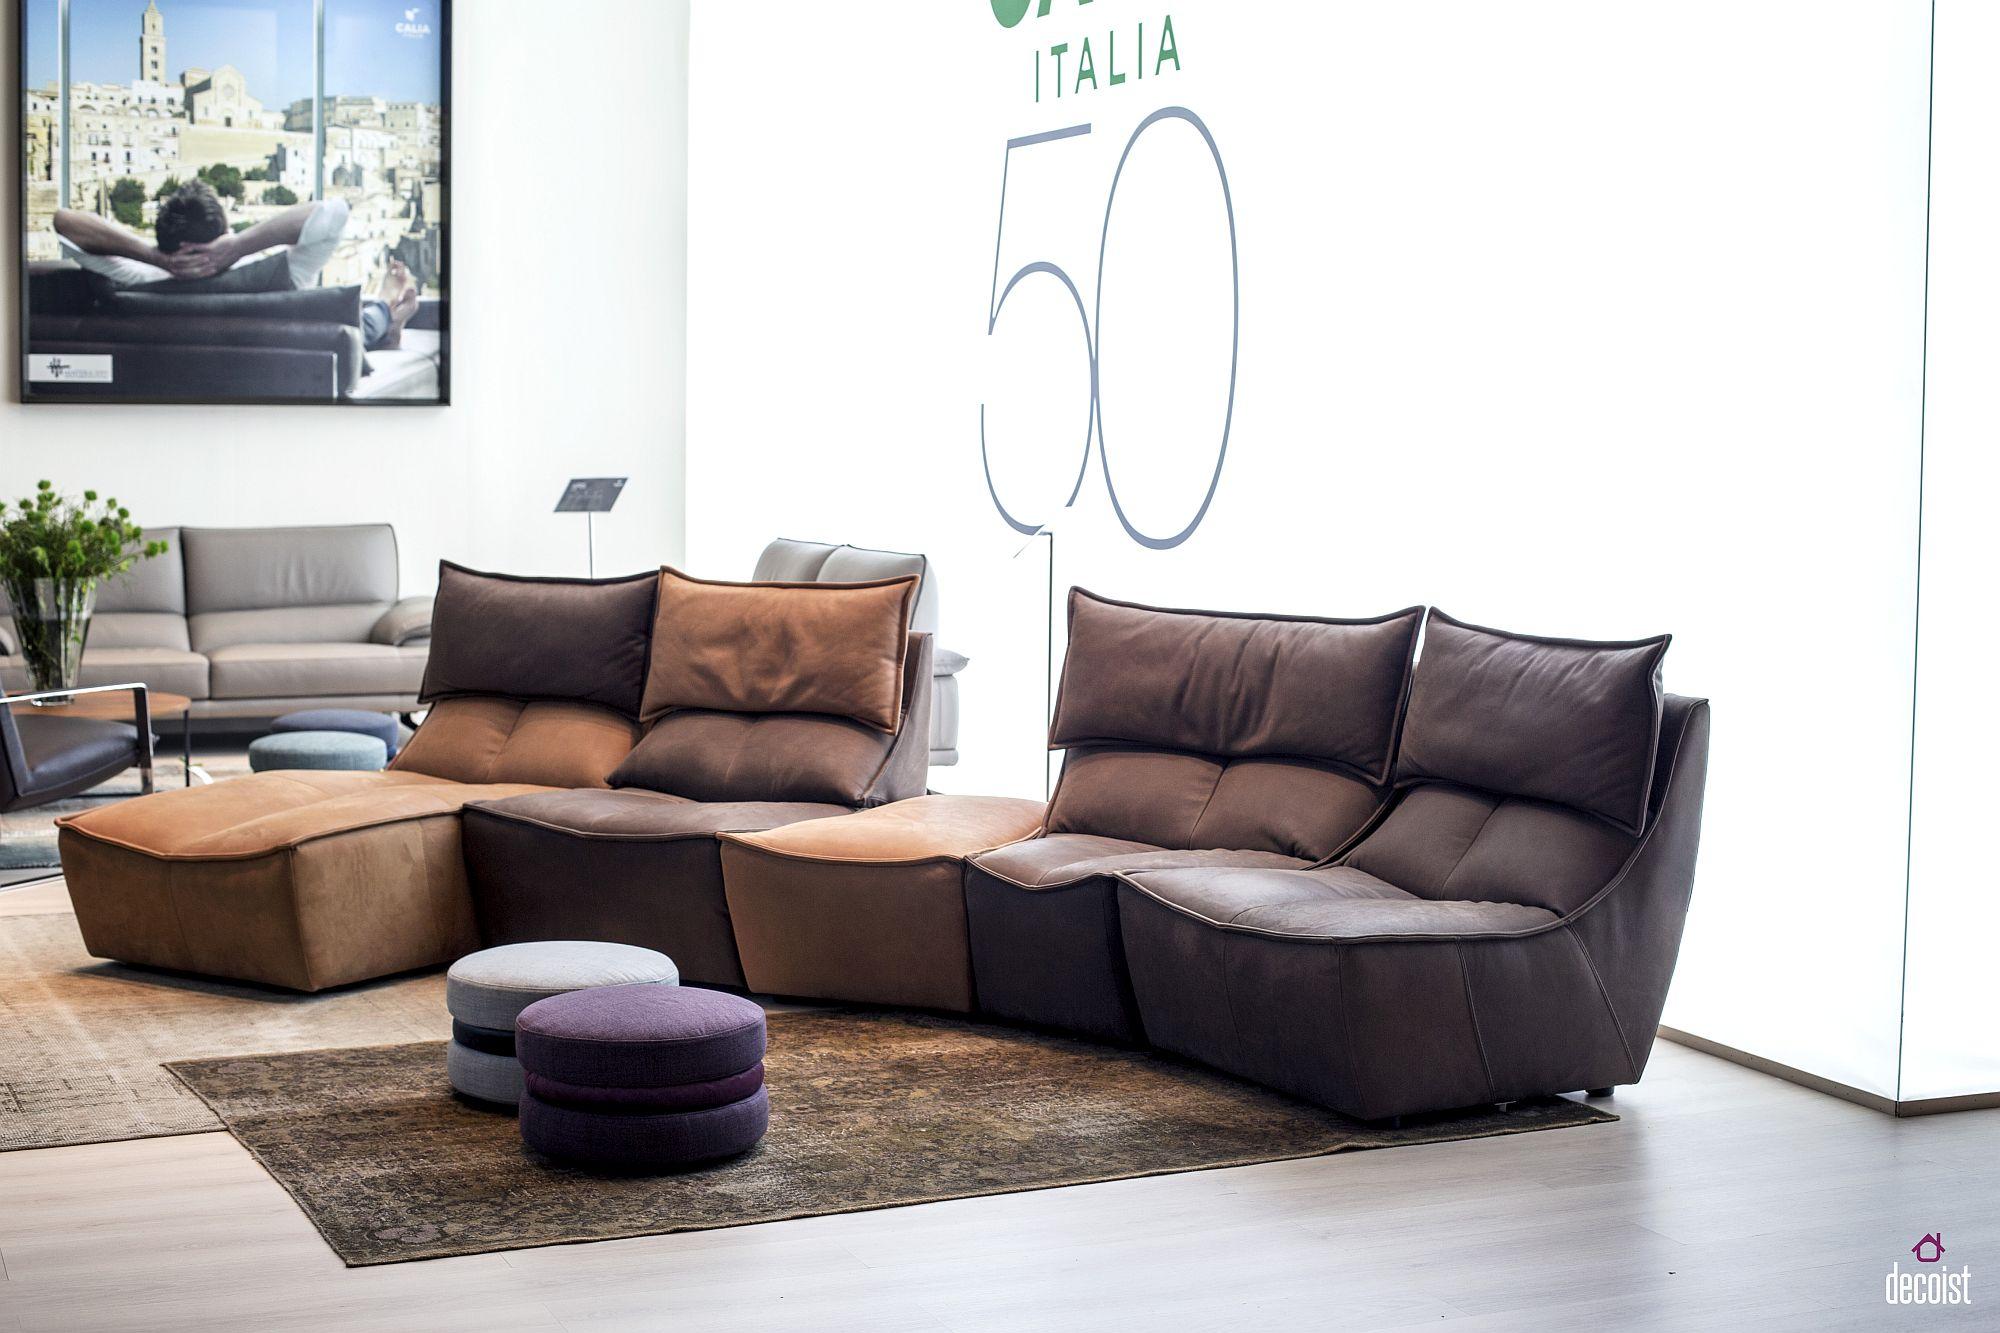 Modular-sofa-units-from-Calia-Italia-add-color-contrast-and-design-comfort